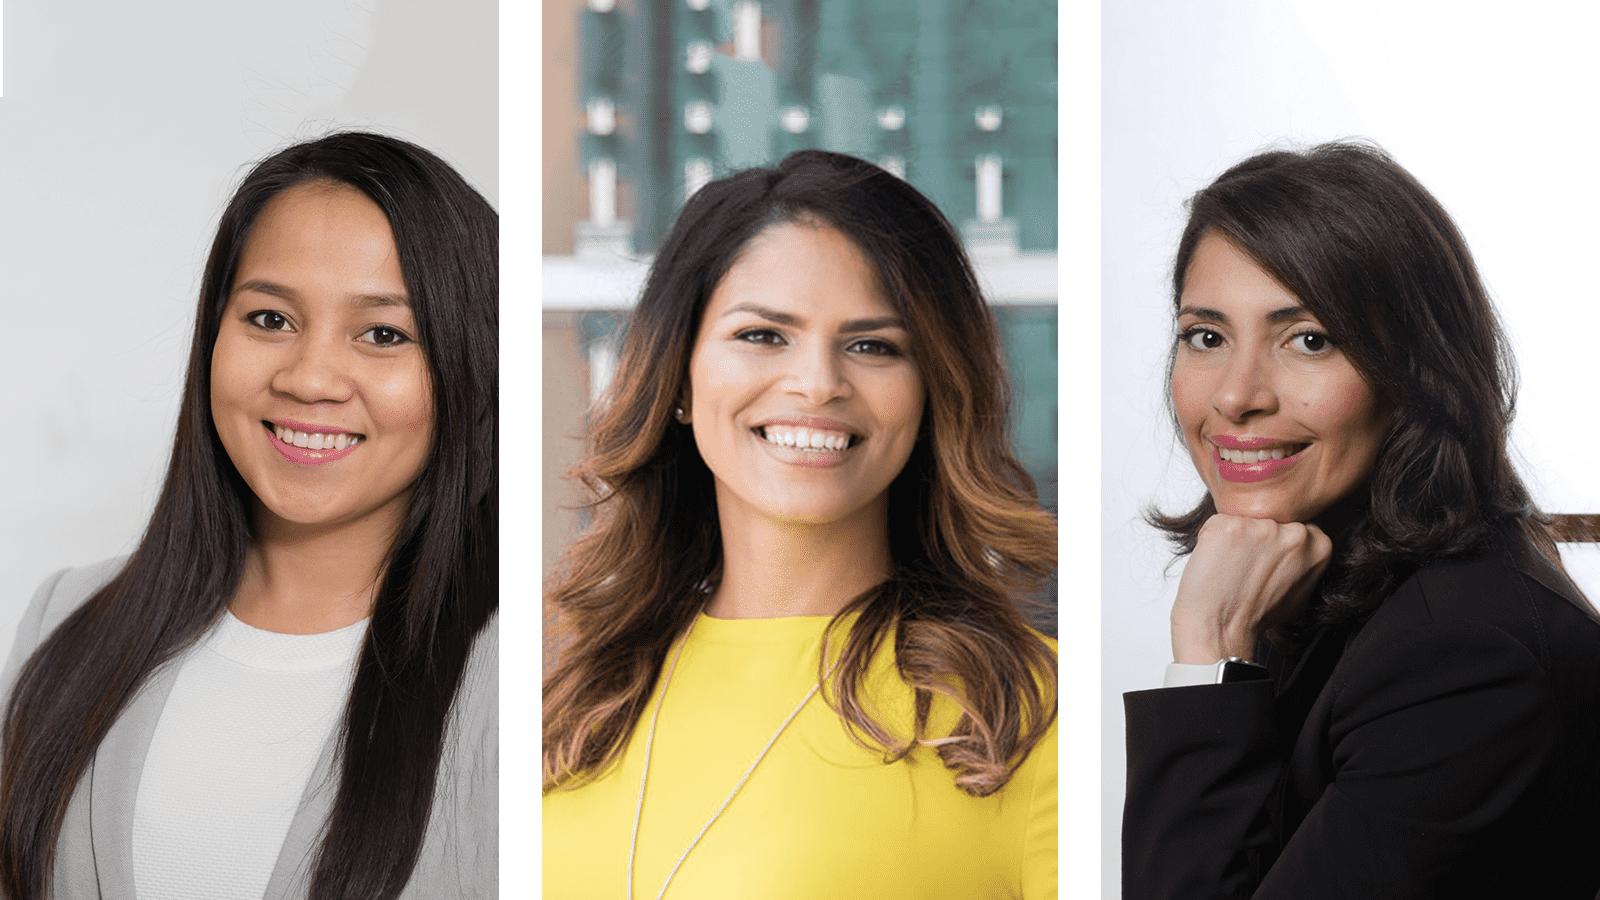 Rosie Chong-Gum, Yubetsy Nieves and Johanna Vazquez